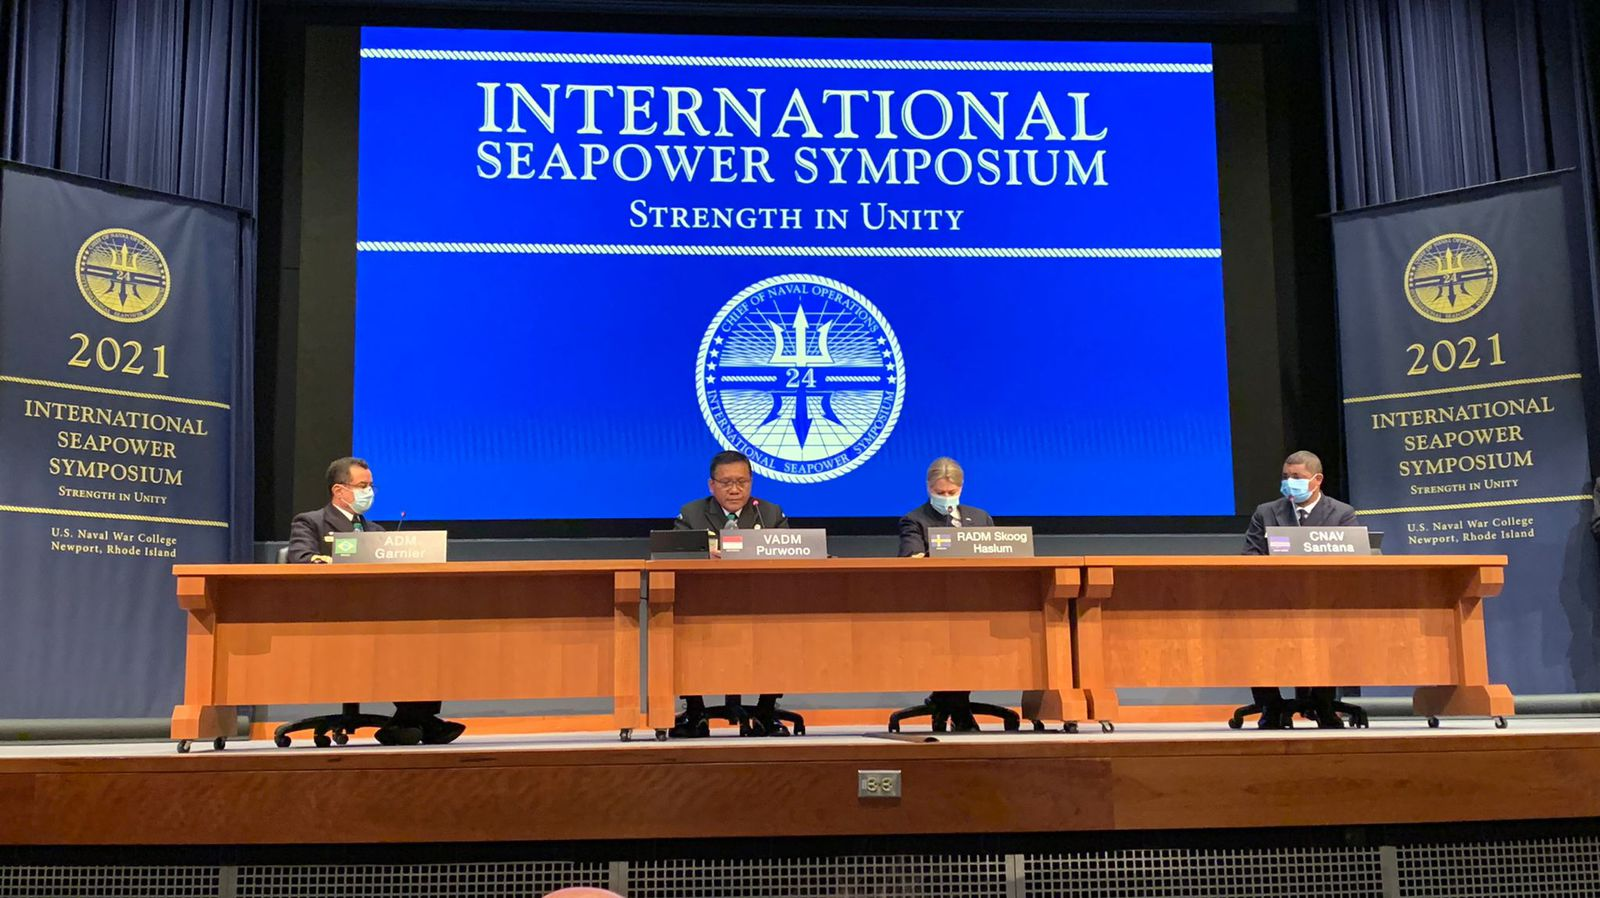 https: img.okezone.com content 2021 09 18 337 2473406 tni-al-berpartisipasi-aktif-dalam-kegiatan-international-seapower-symposium-2021-di-amerika-a4ZnJOUc5z.jpeg